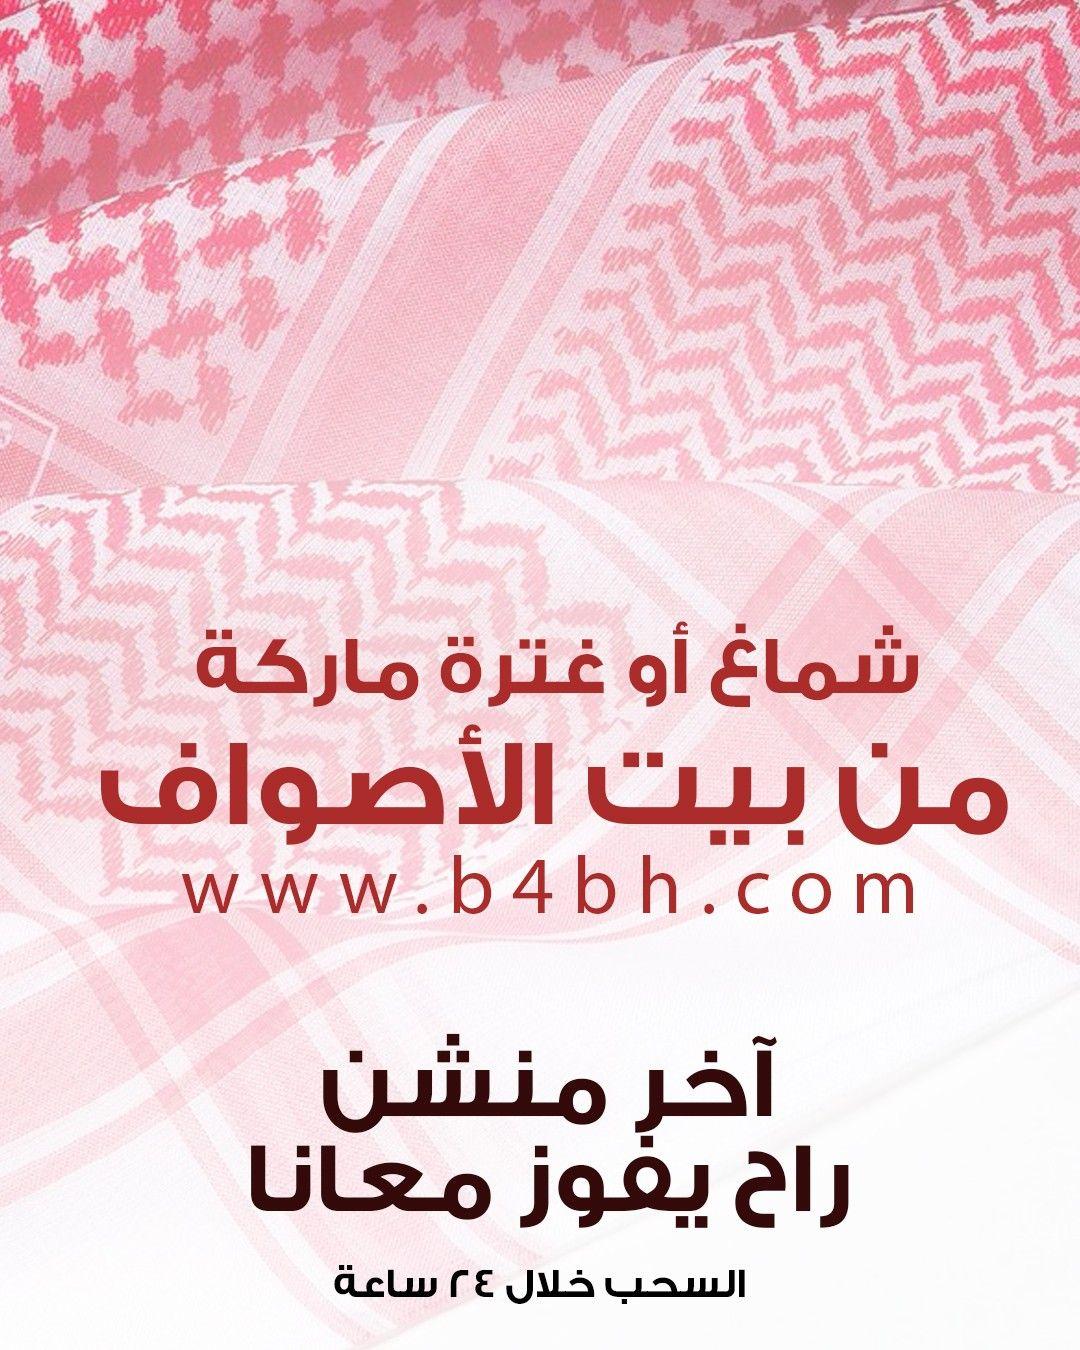 منشن شخص وسيتم السحب بأي وقت على الفائز شكرا Jasim Alkooheji Sharifgroupbh فعاليات البحرين Bahrain Events Instagram Posts Instagram Movie Posters